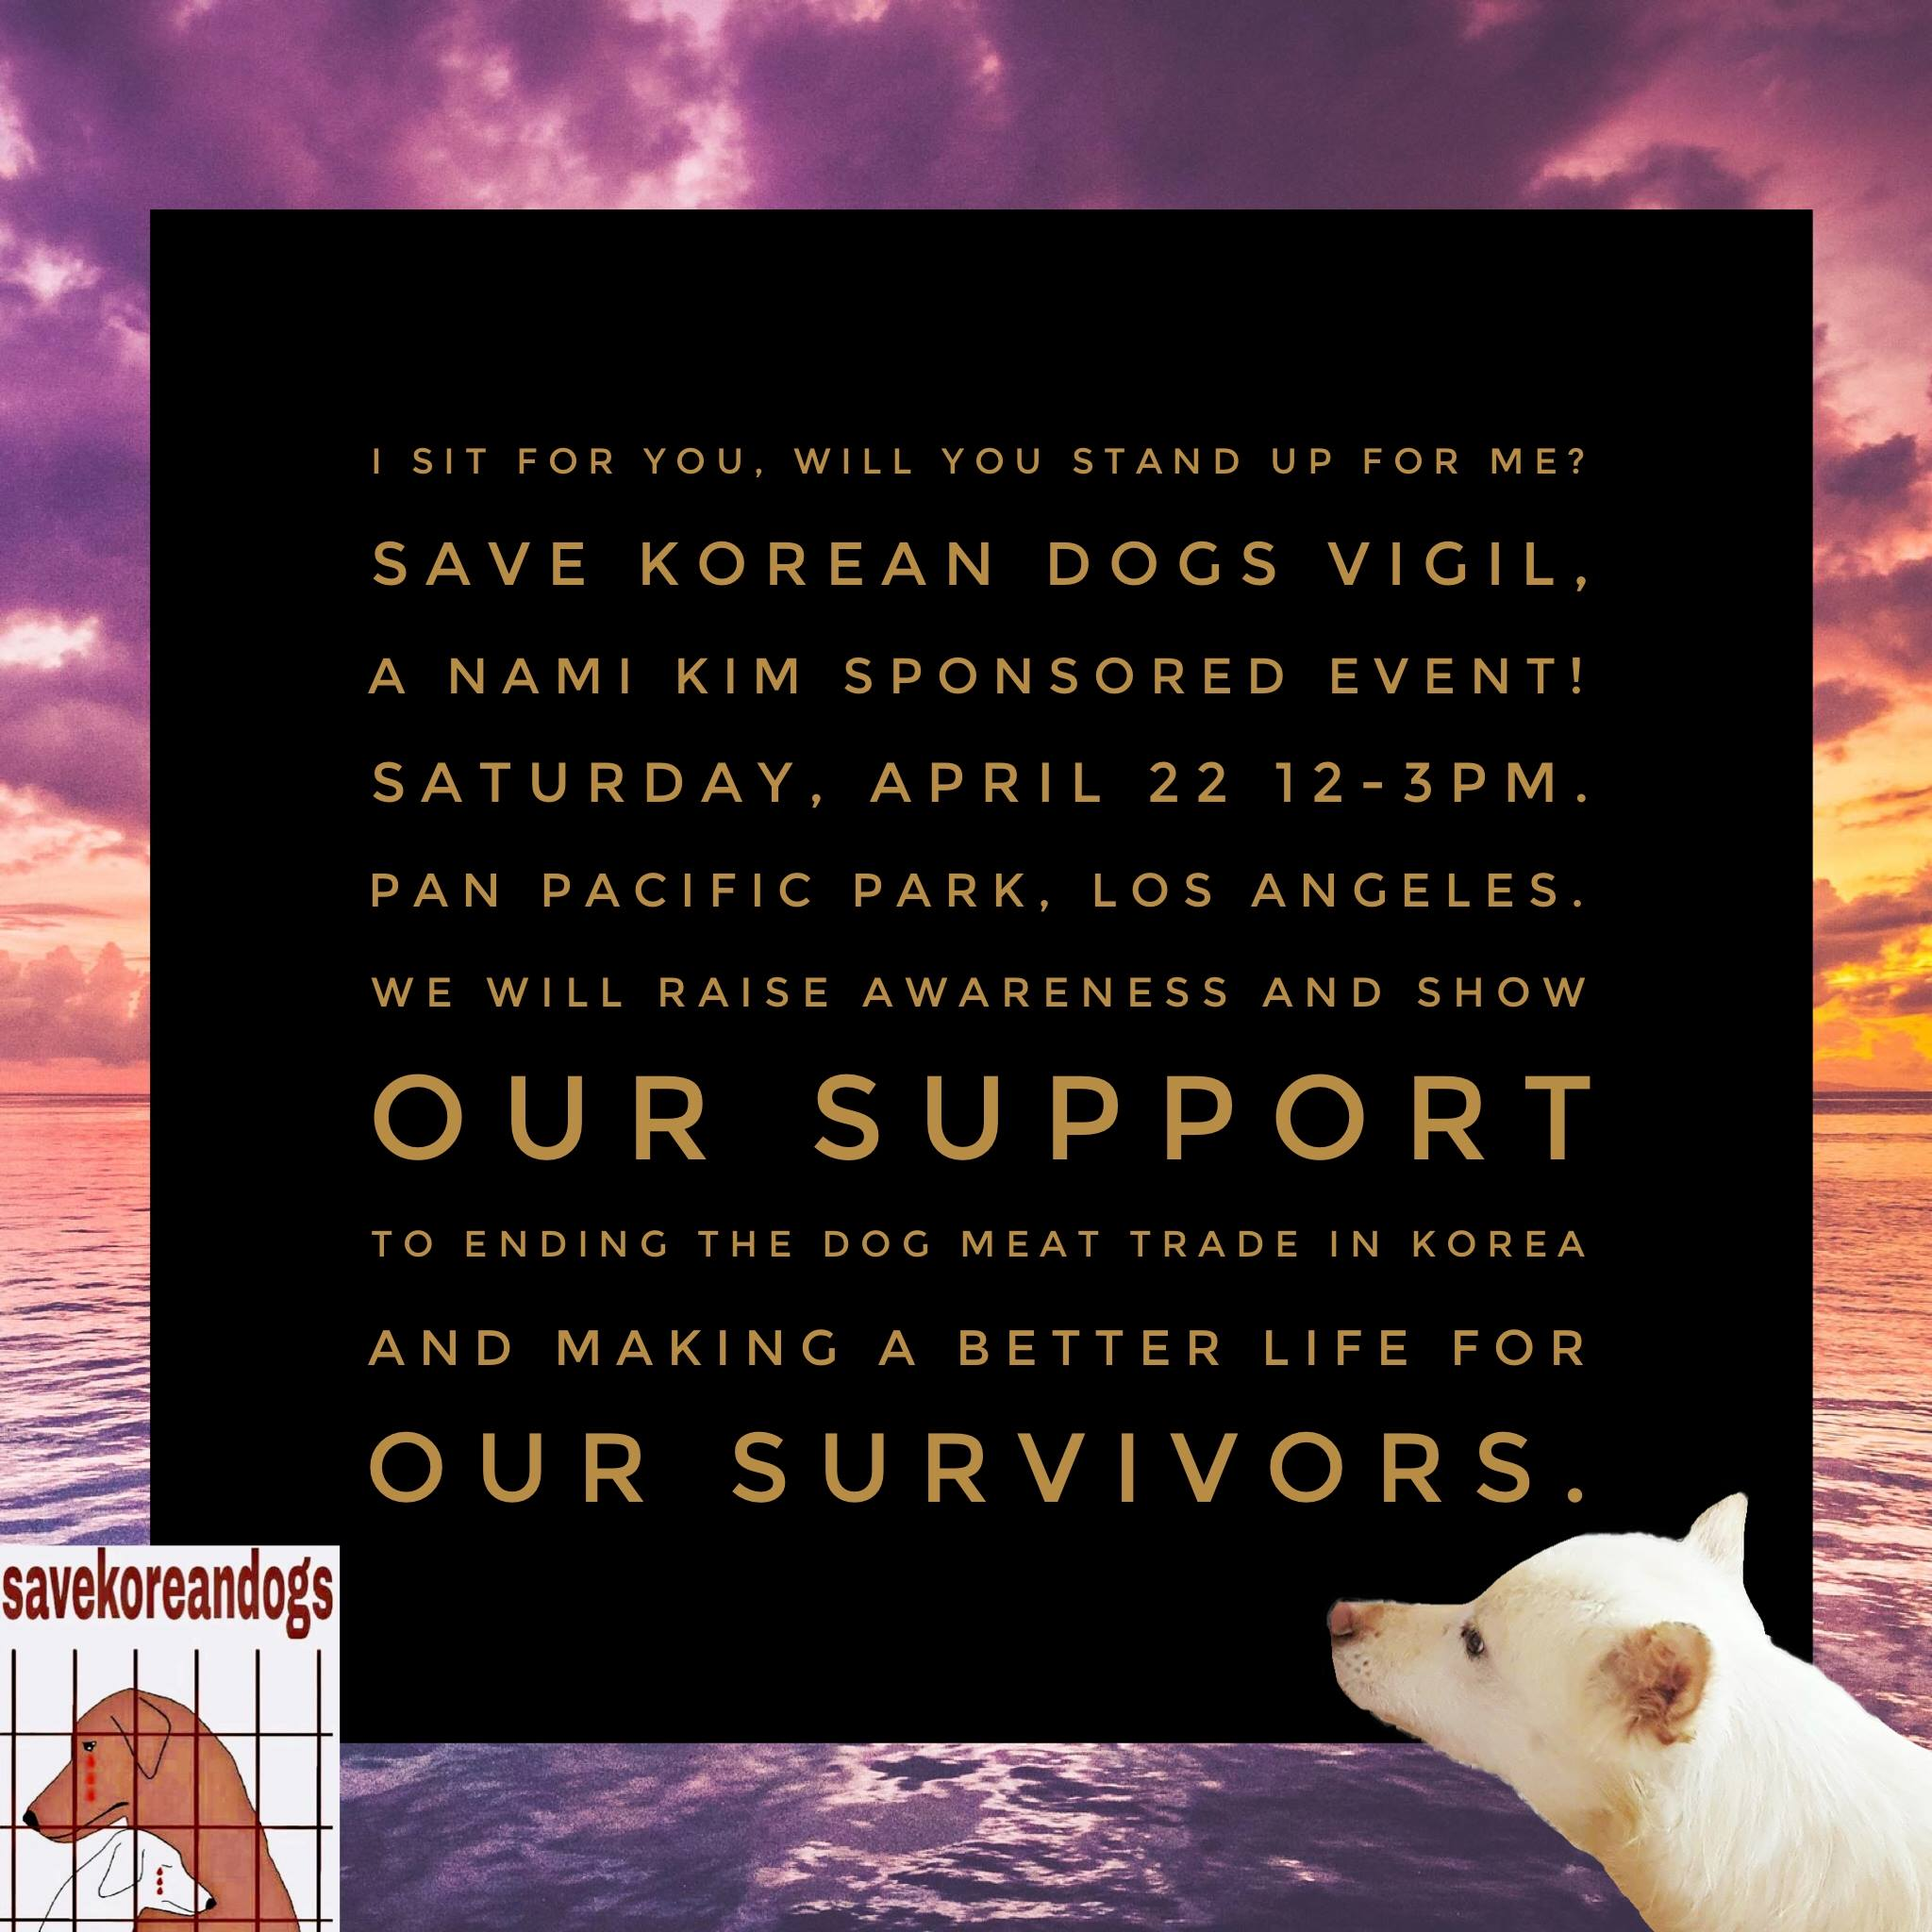 Pan Pacific Park / Save Korean Dogs Vigil